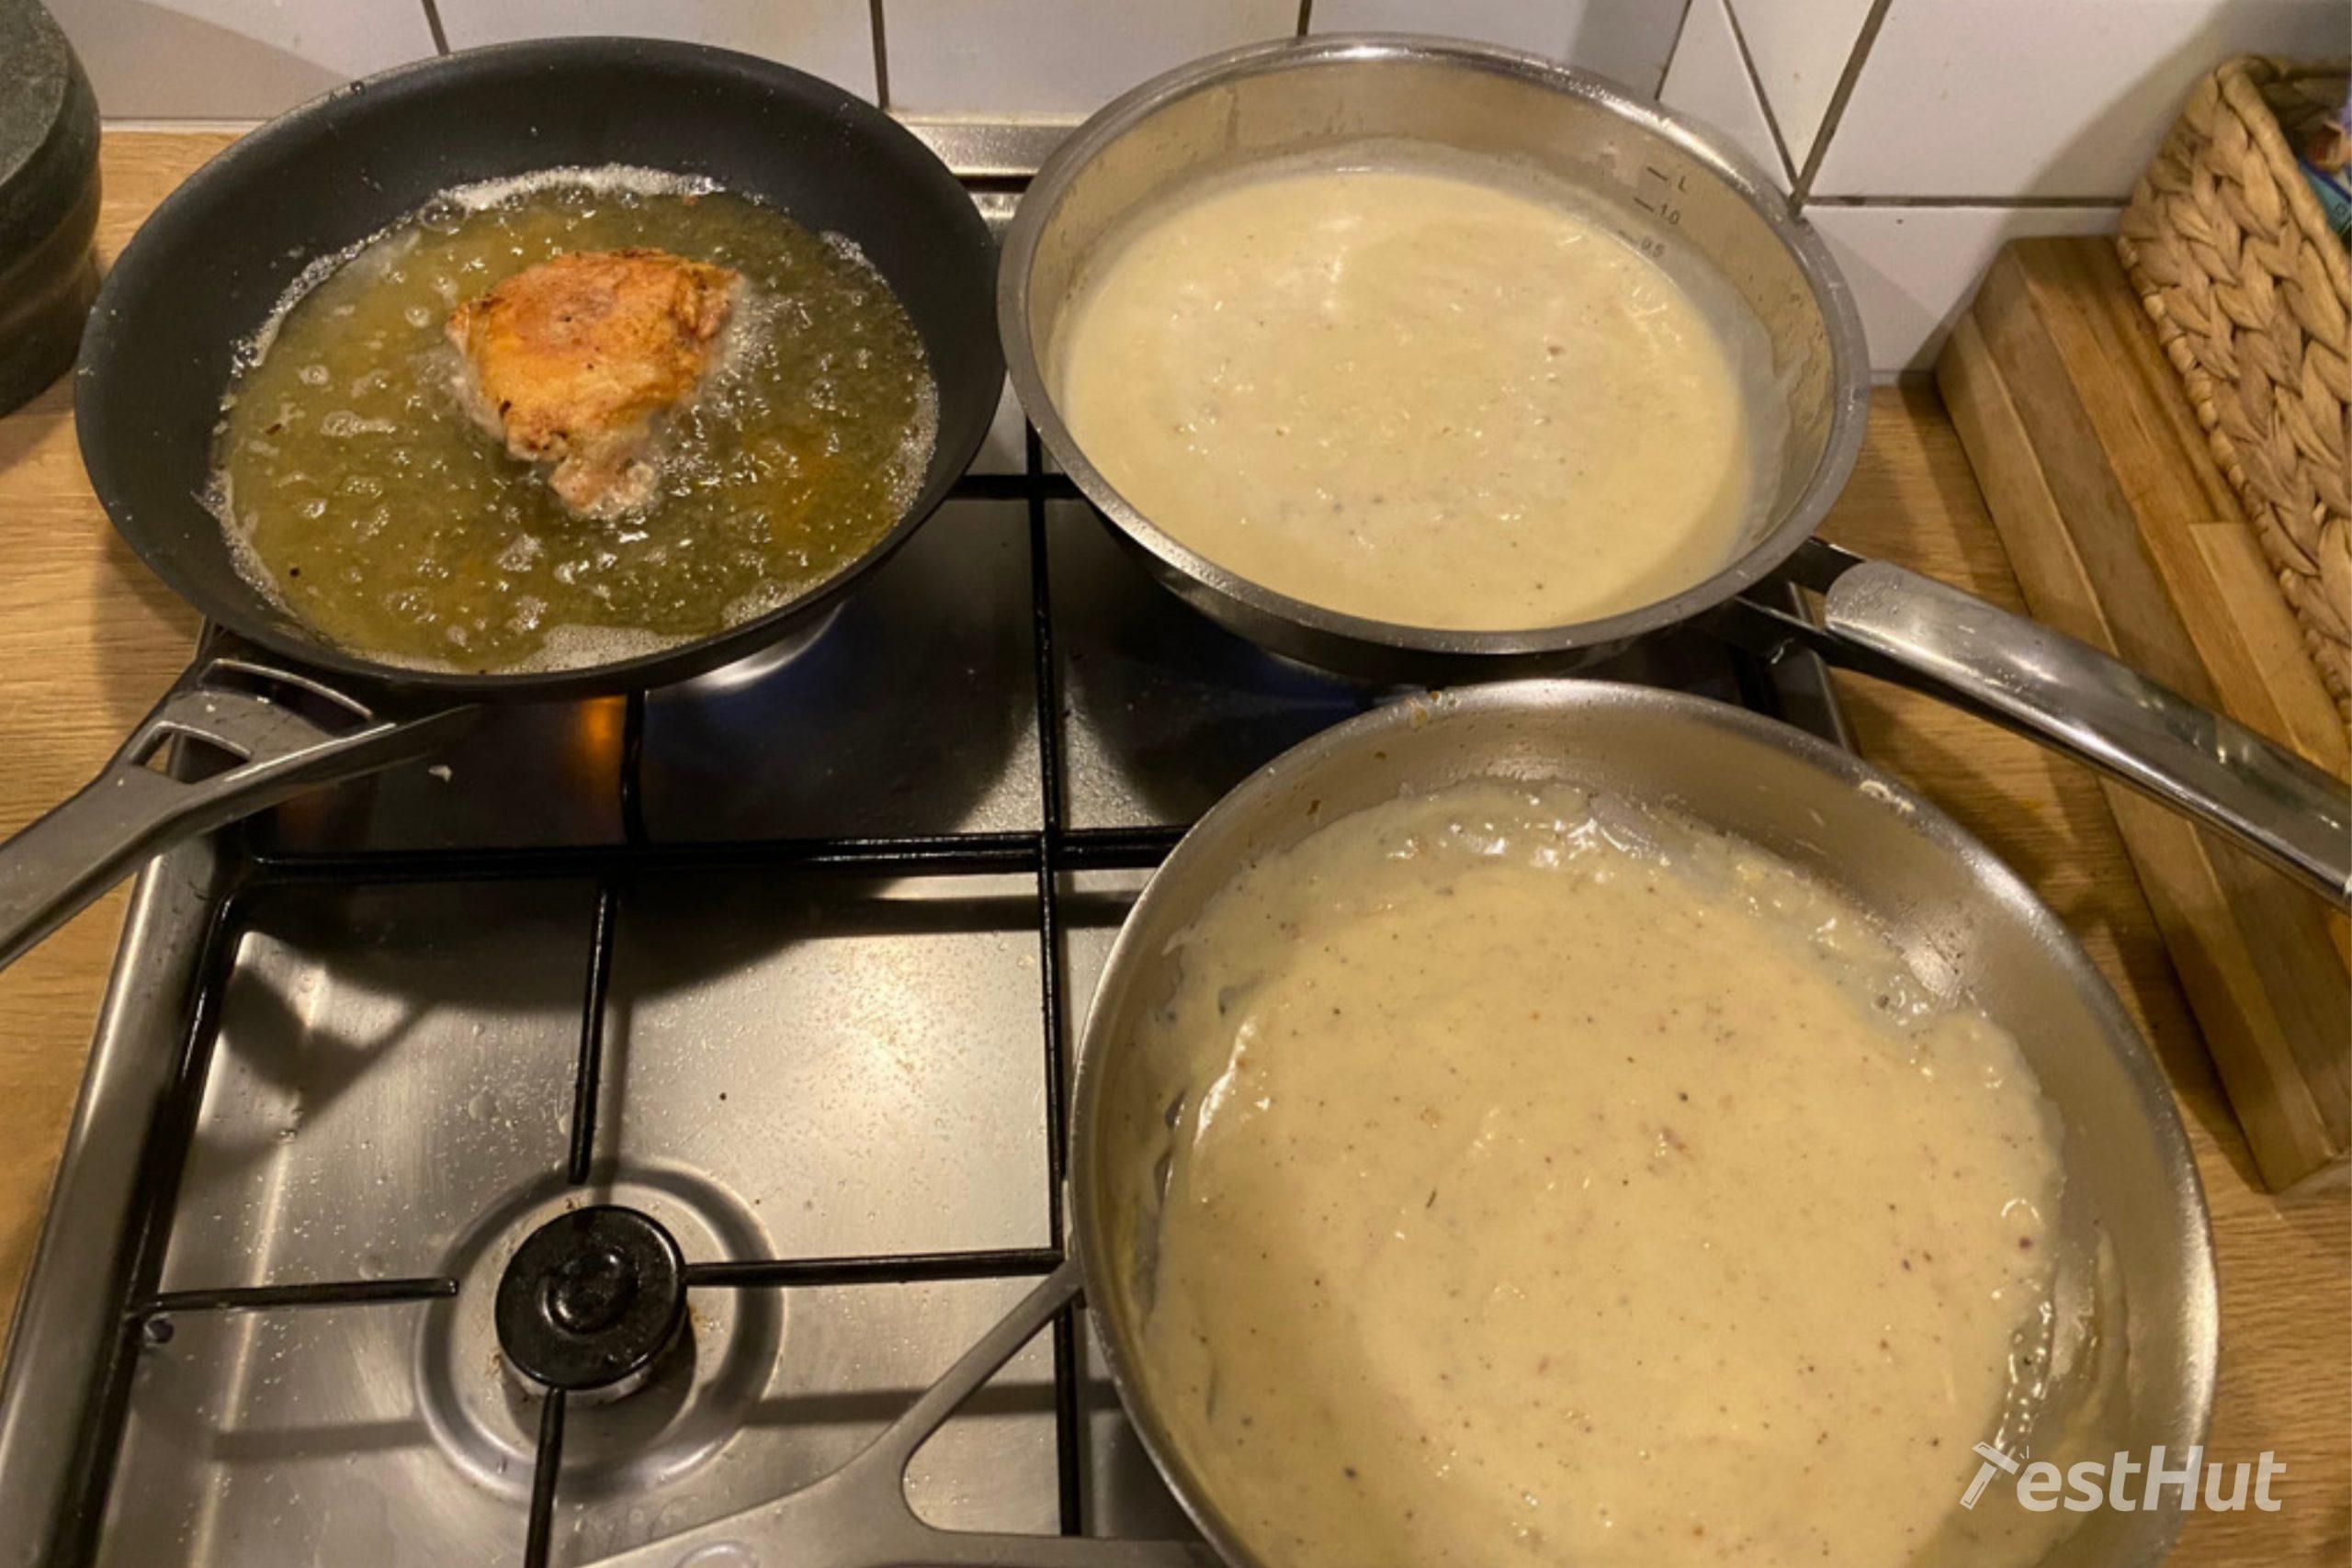 Frying pan versatility